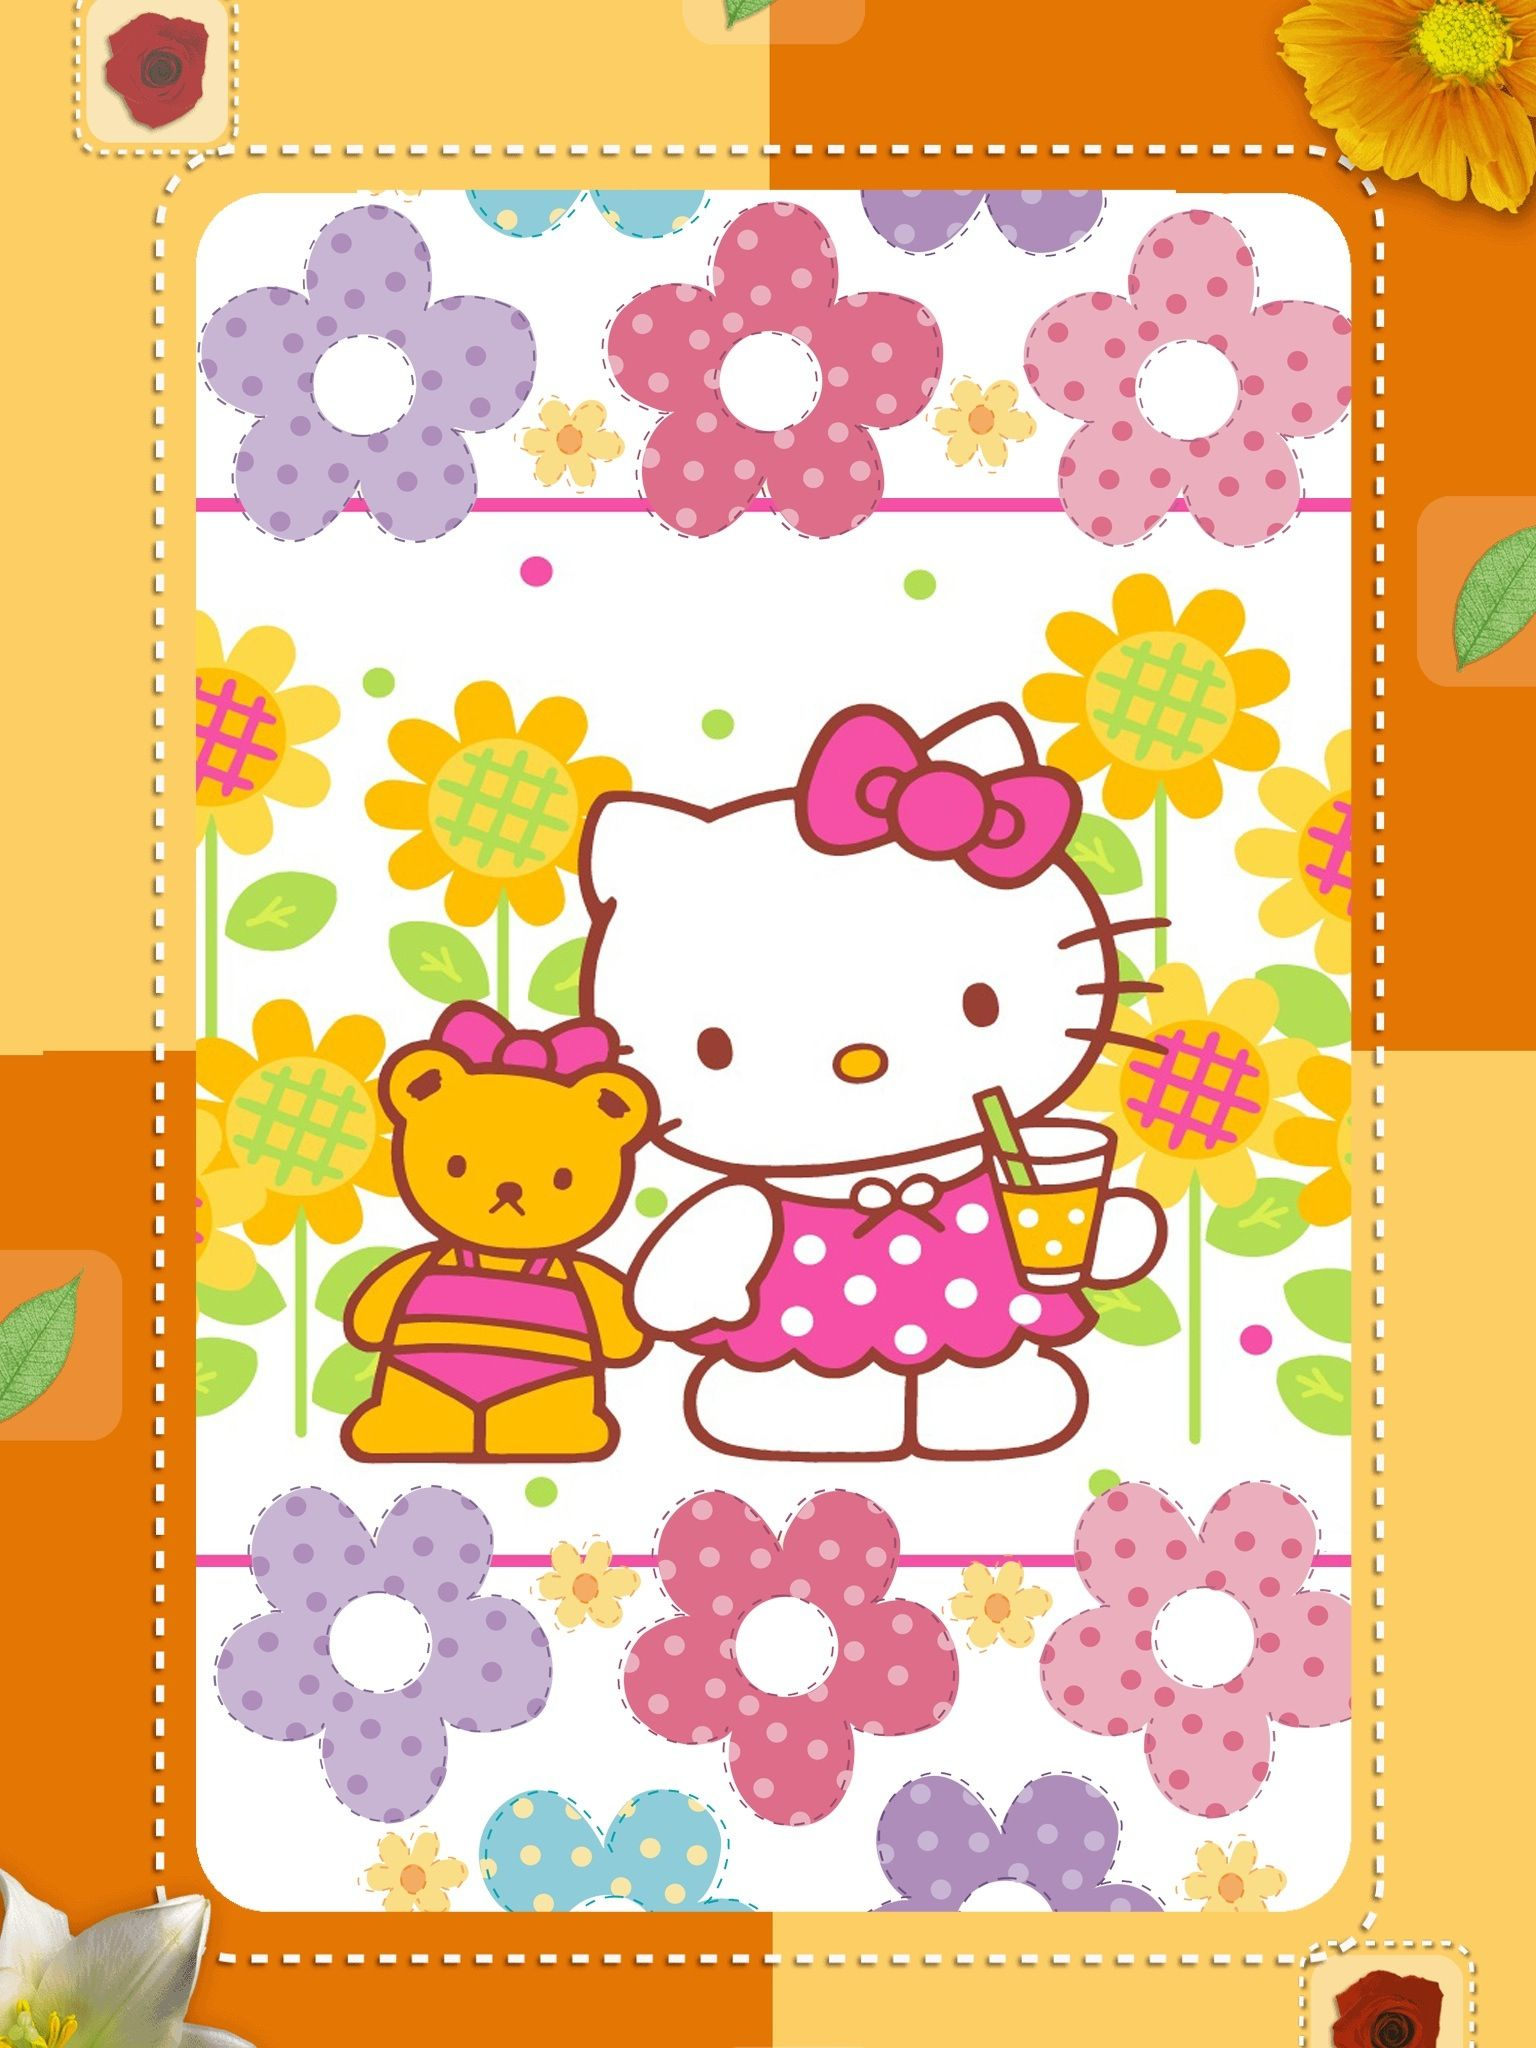 Amazing Wallpaper Hello Kitty Orange - 7cfd7e83fff3b2e43814bef58c43af60  Snapshot_983283.jpg